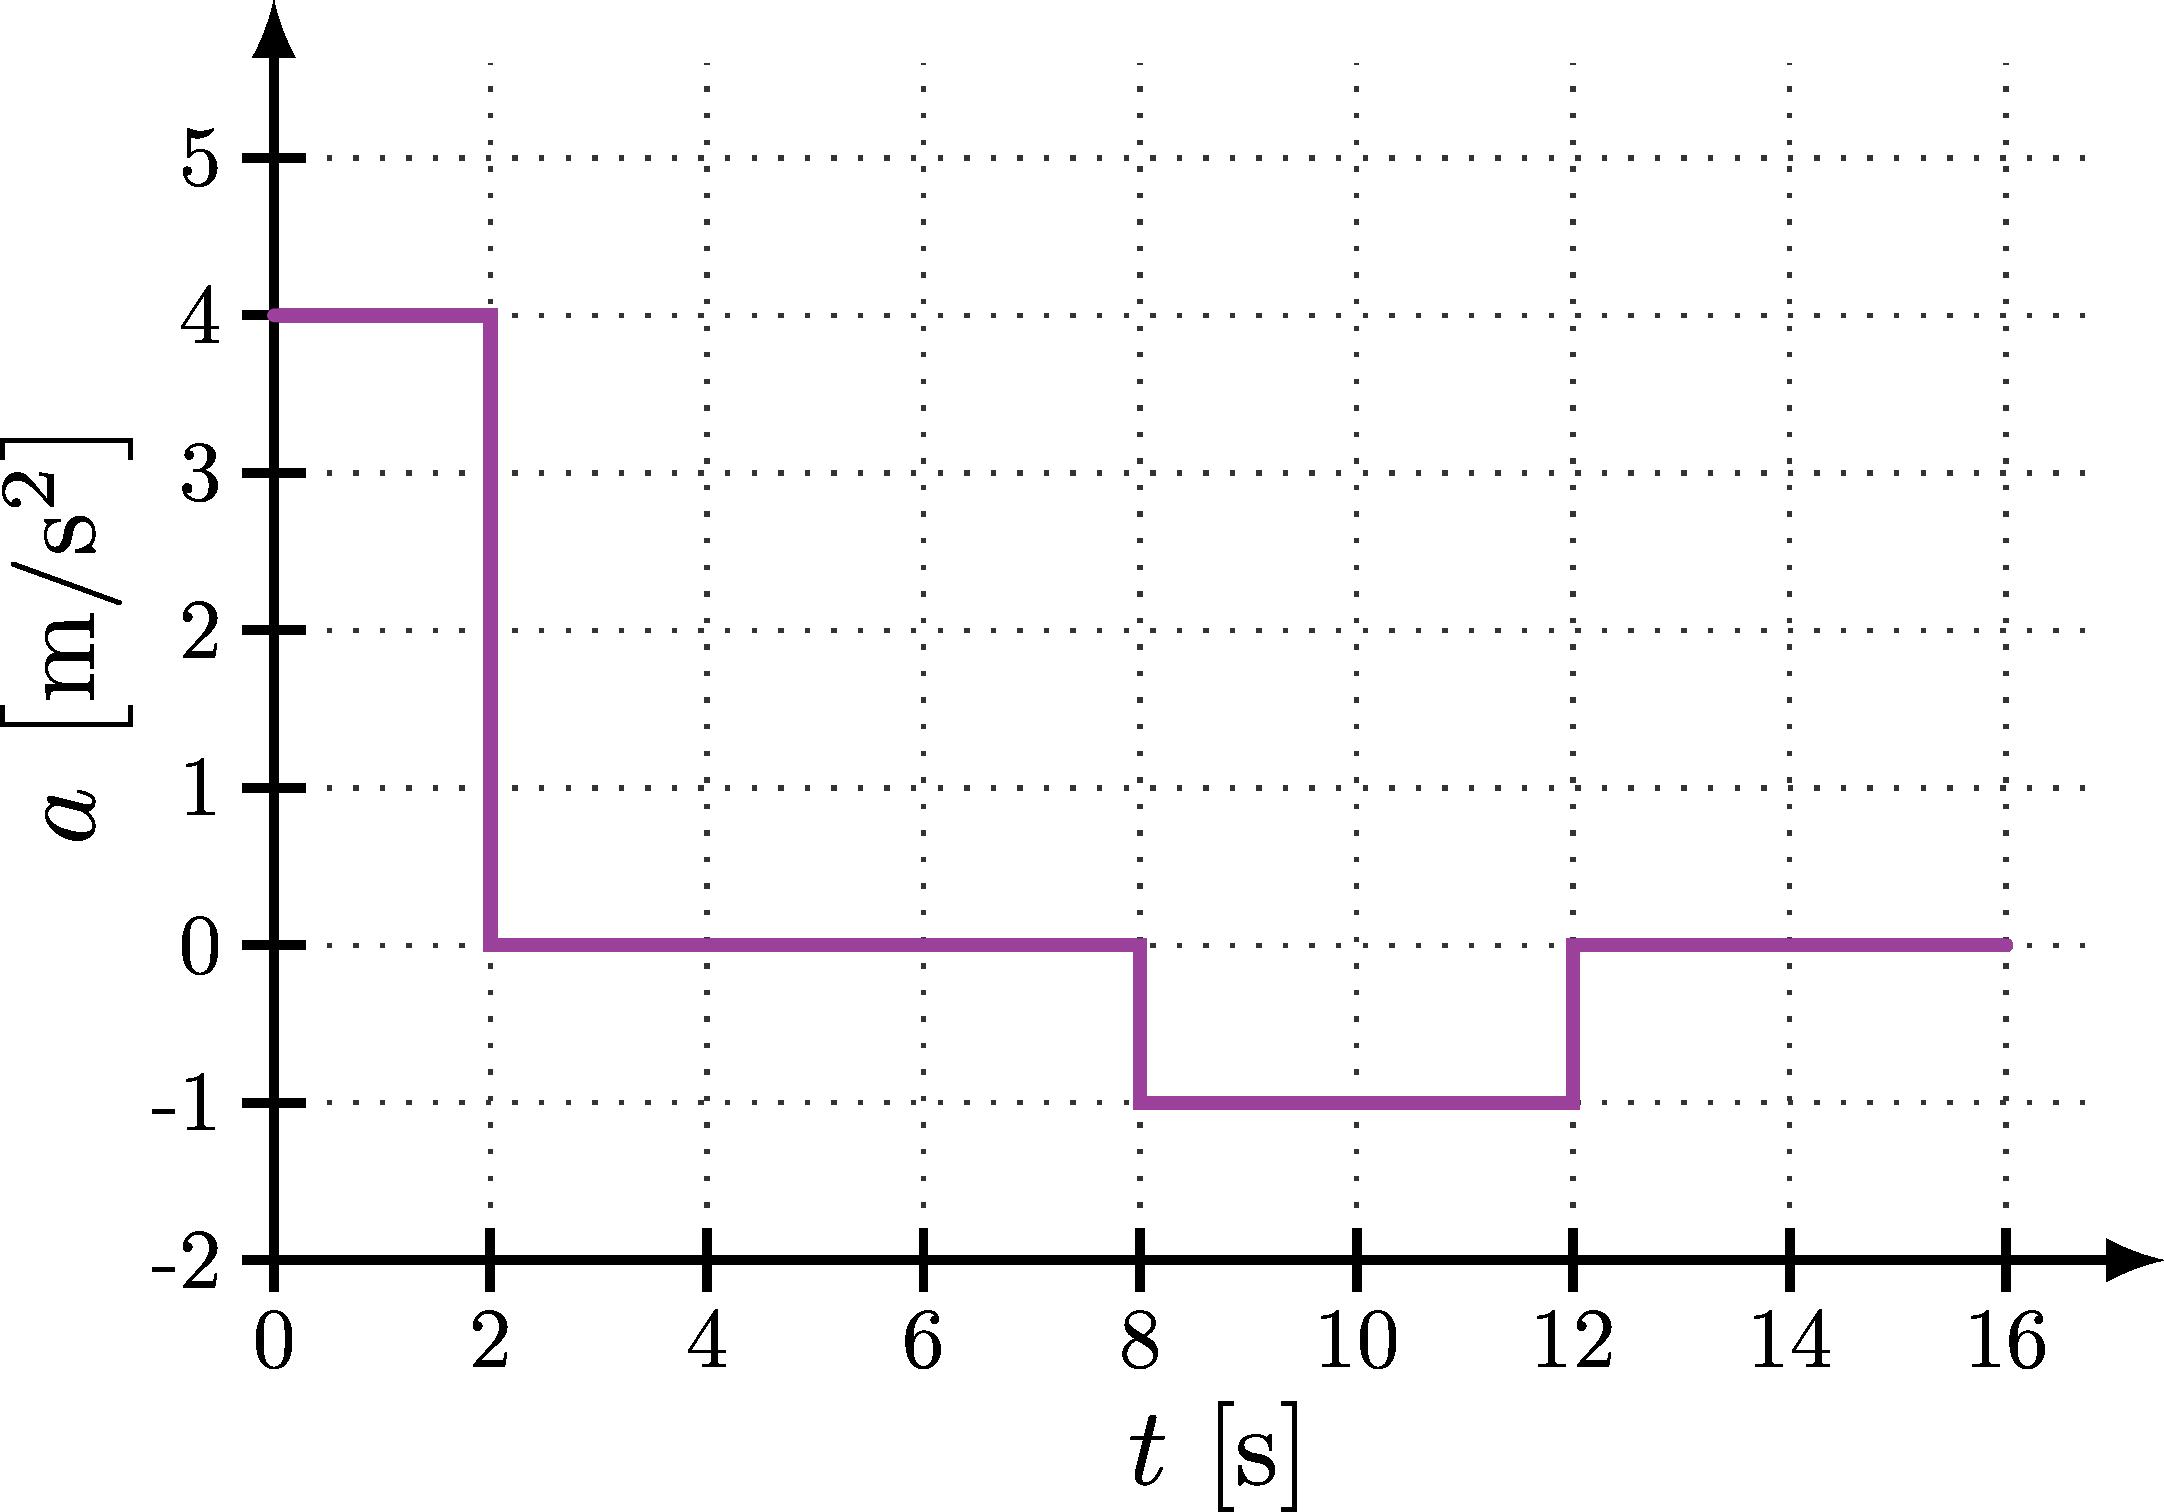 kinematics_graph-002.png